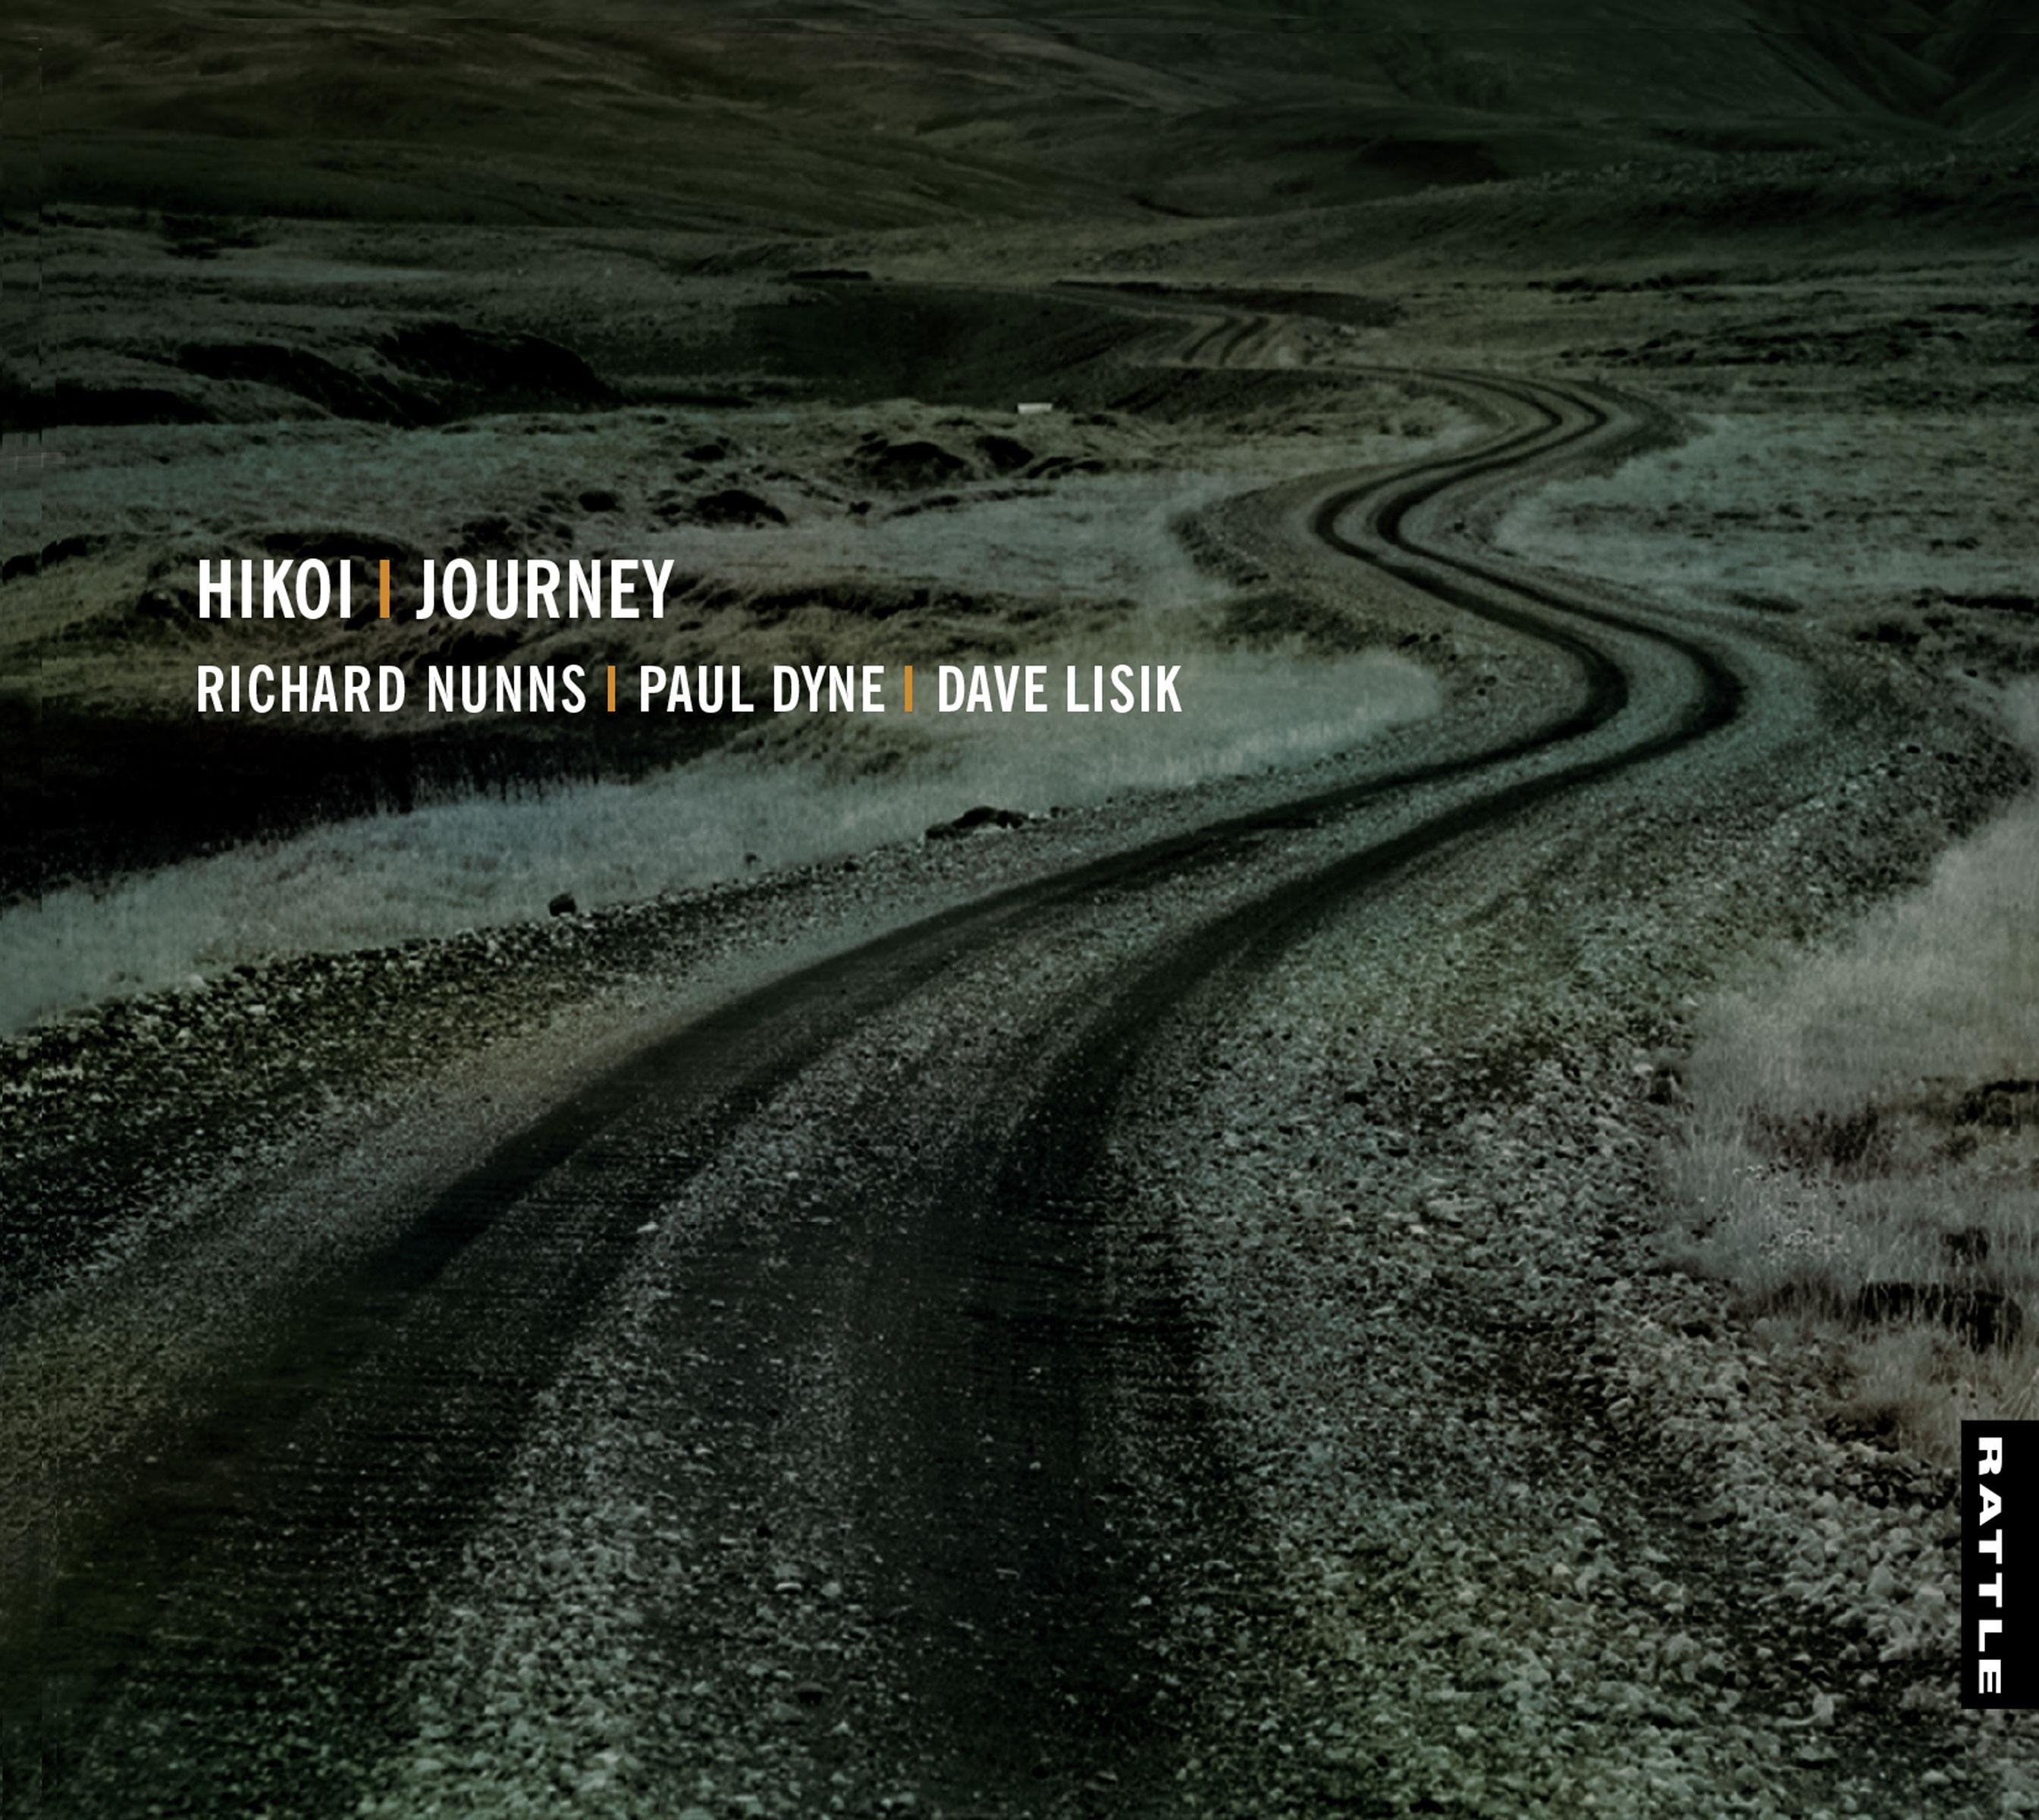 Richard Nunns, Paul Dyne, Dave Lisik | Hikoi / Journey - downloadable MP3 ALBUM